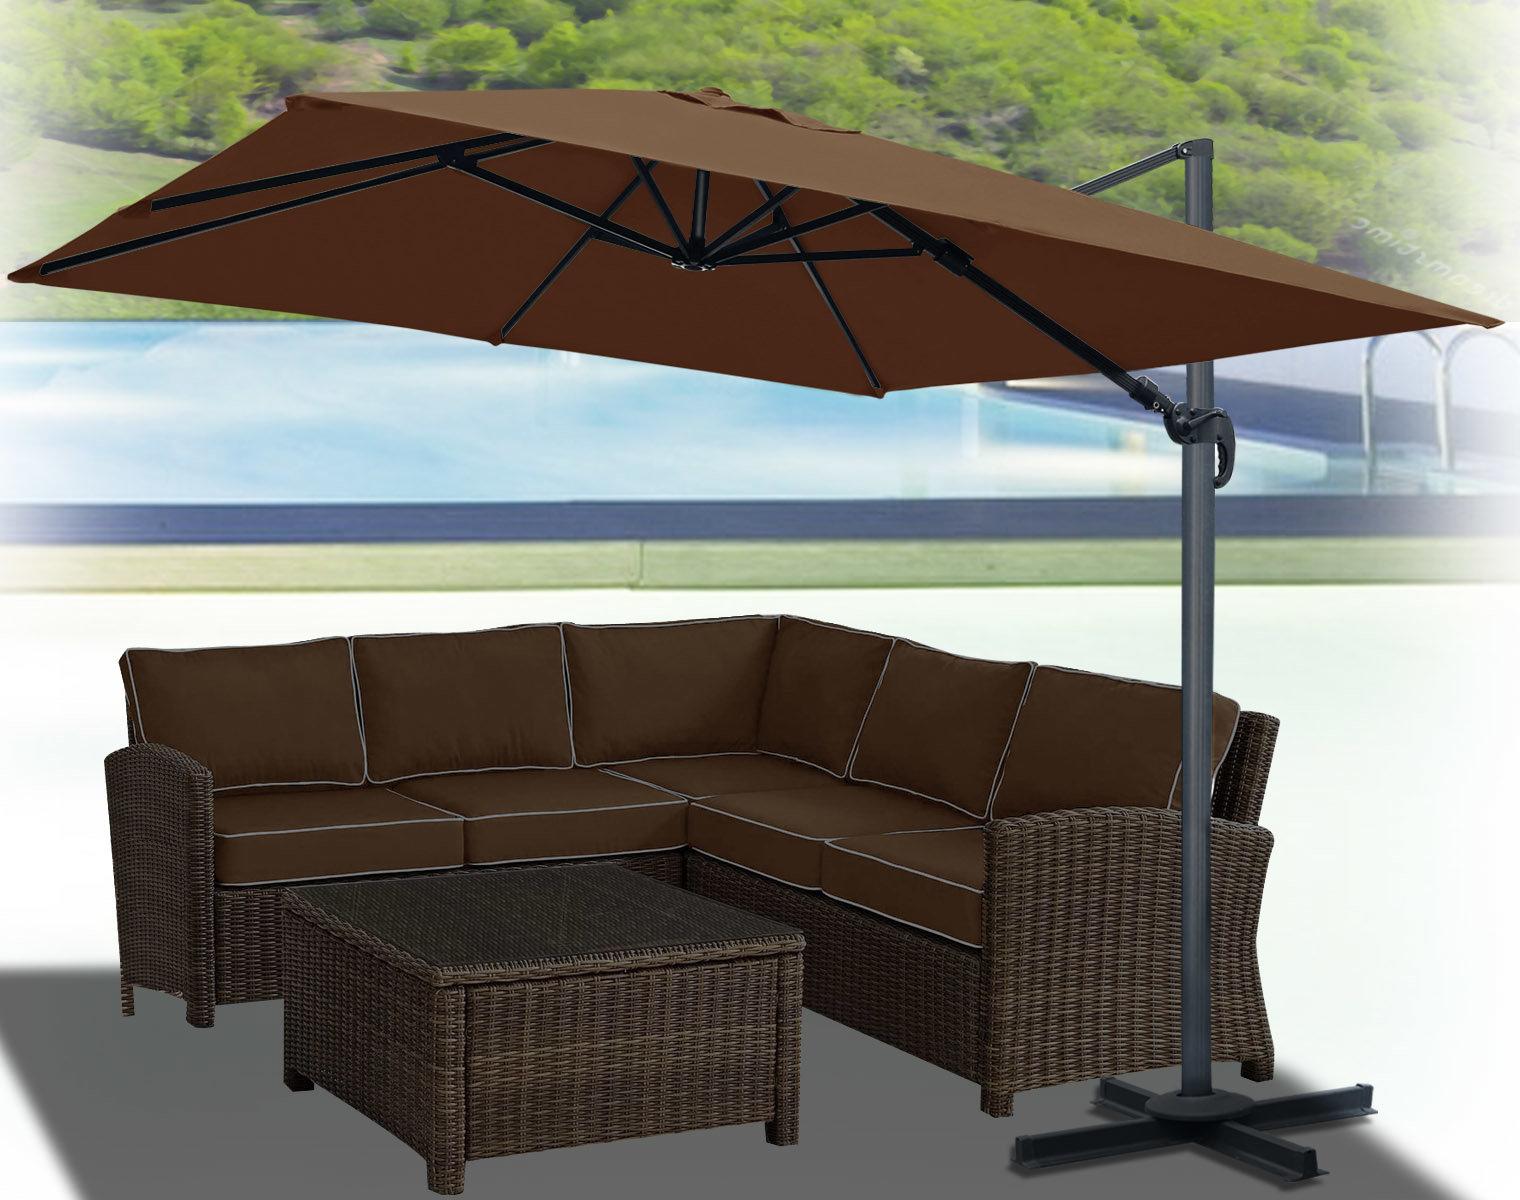 Newest Desmond Rectangular Cantilever Umbrellas Inside Klass Hanging Patio 10' Square Cantilever Umbrella (View 7 of 20)